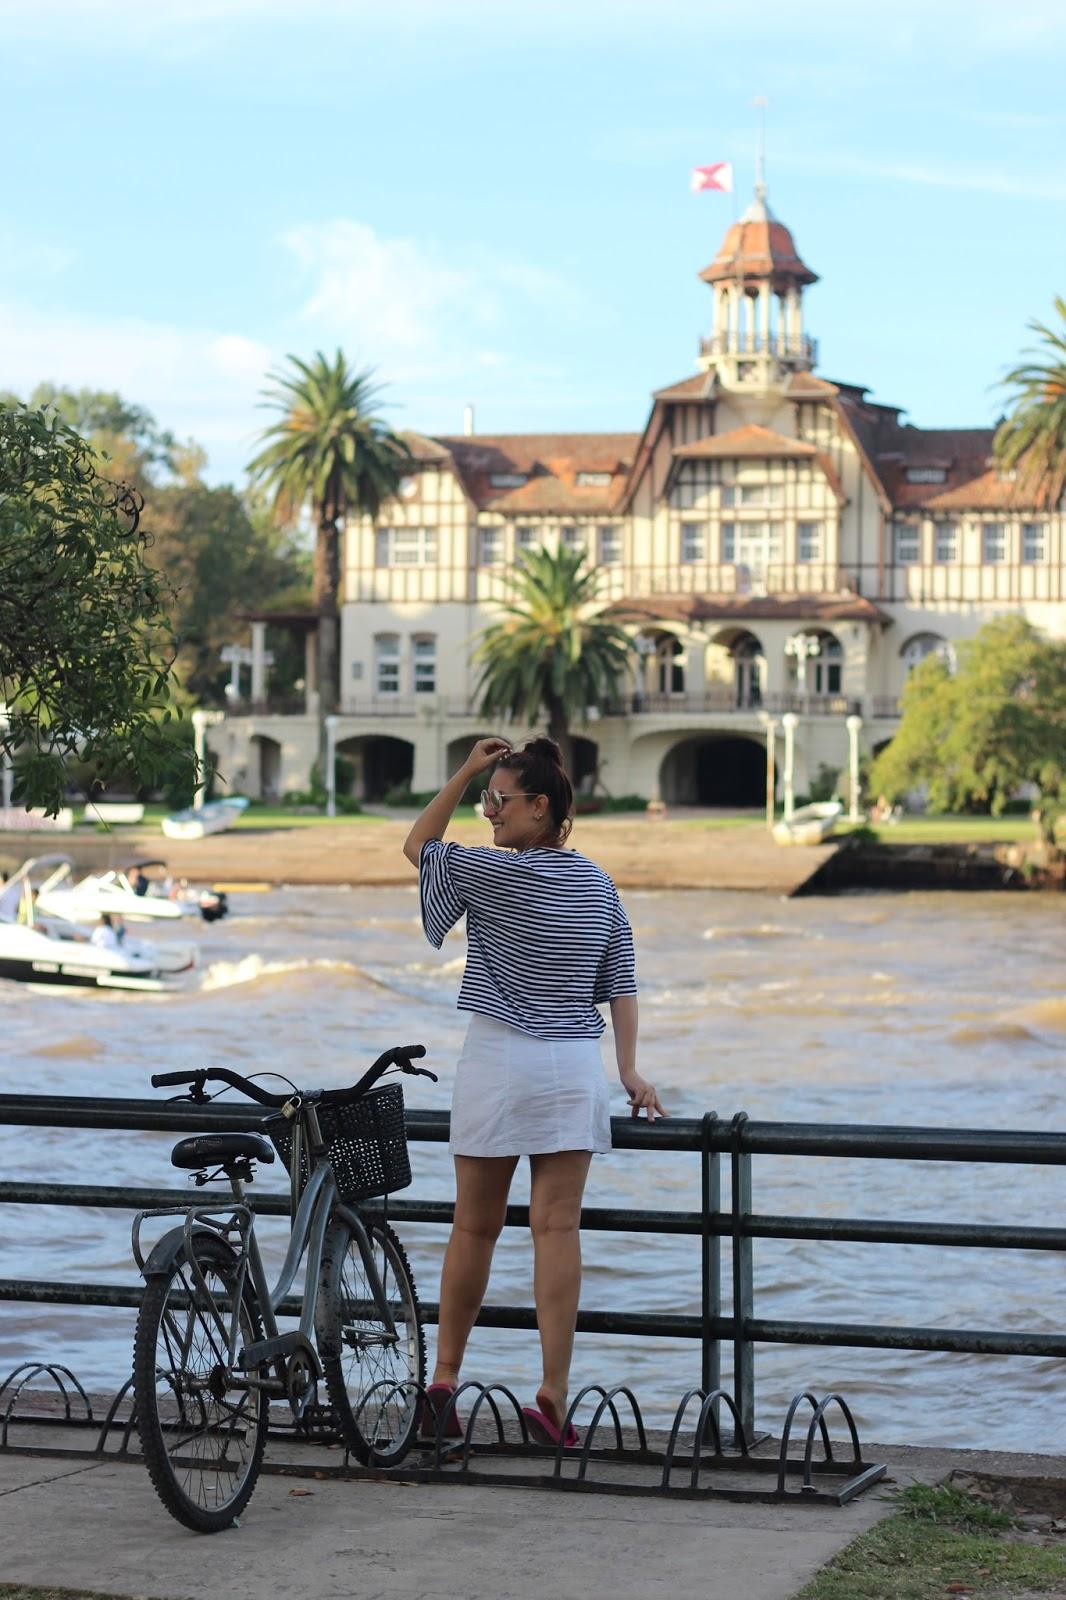 delta turismo buenos aires